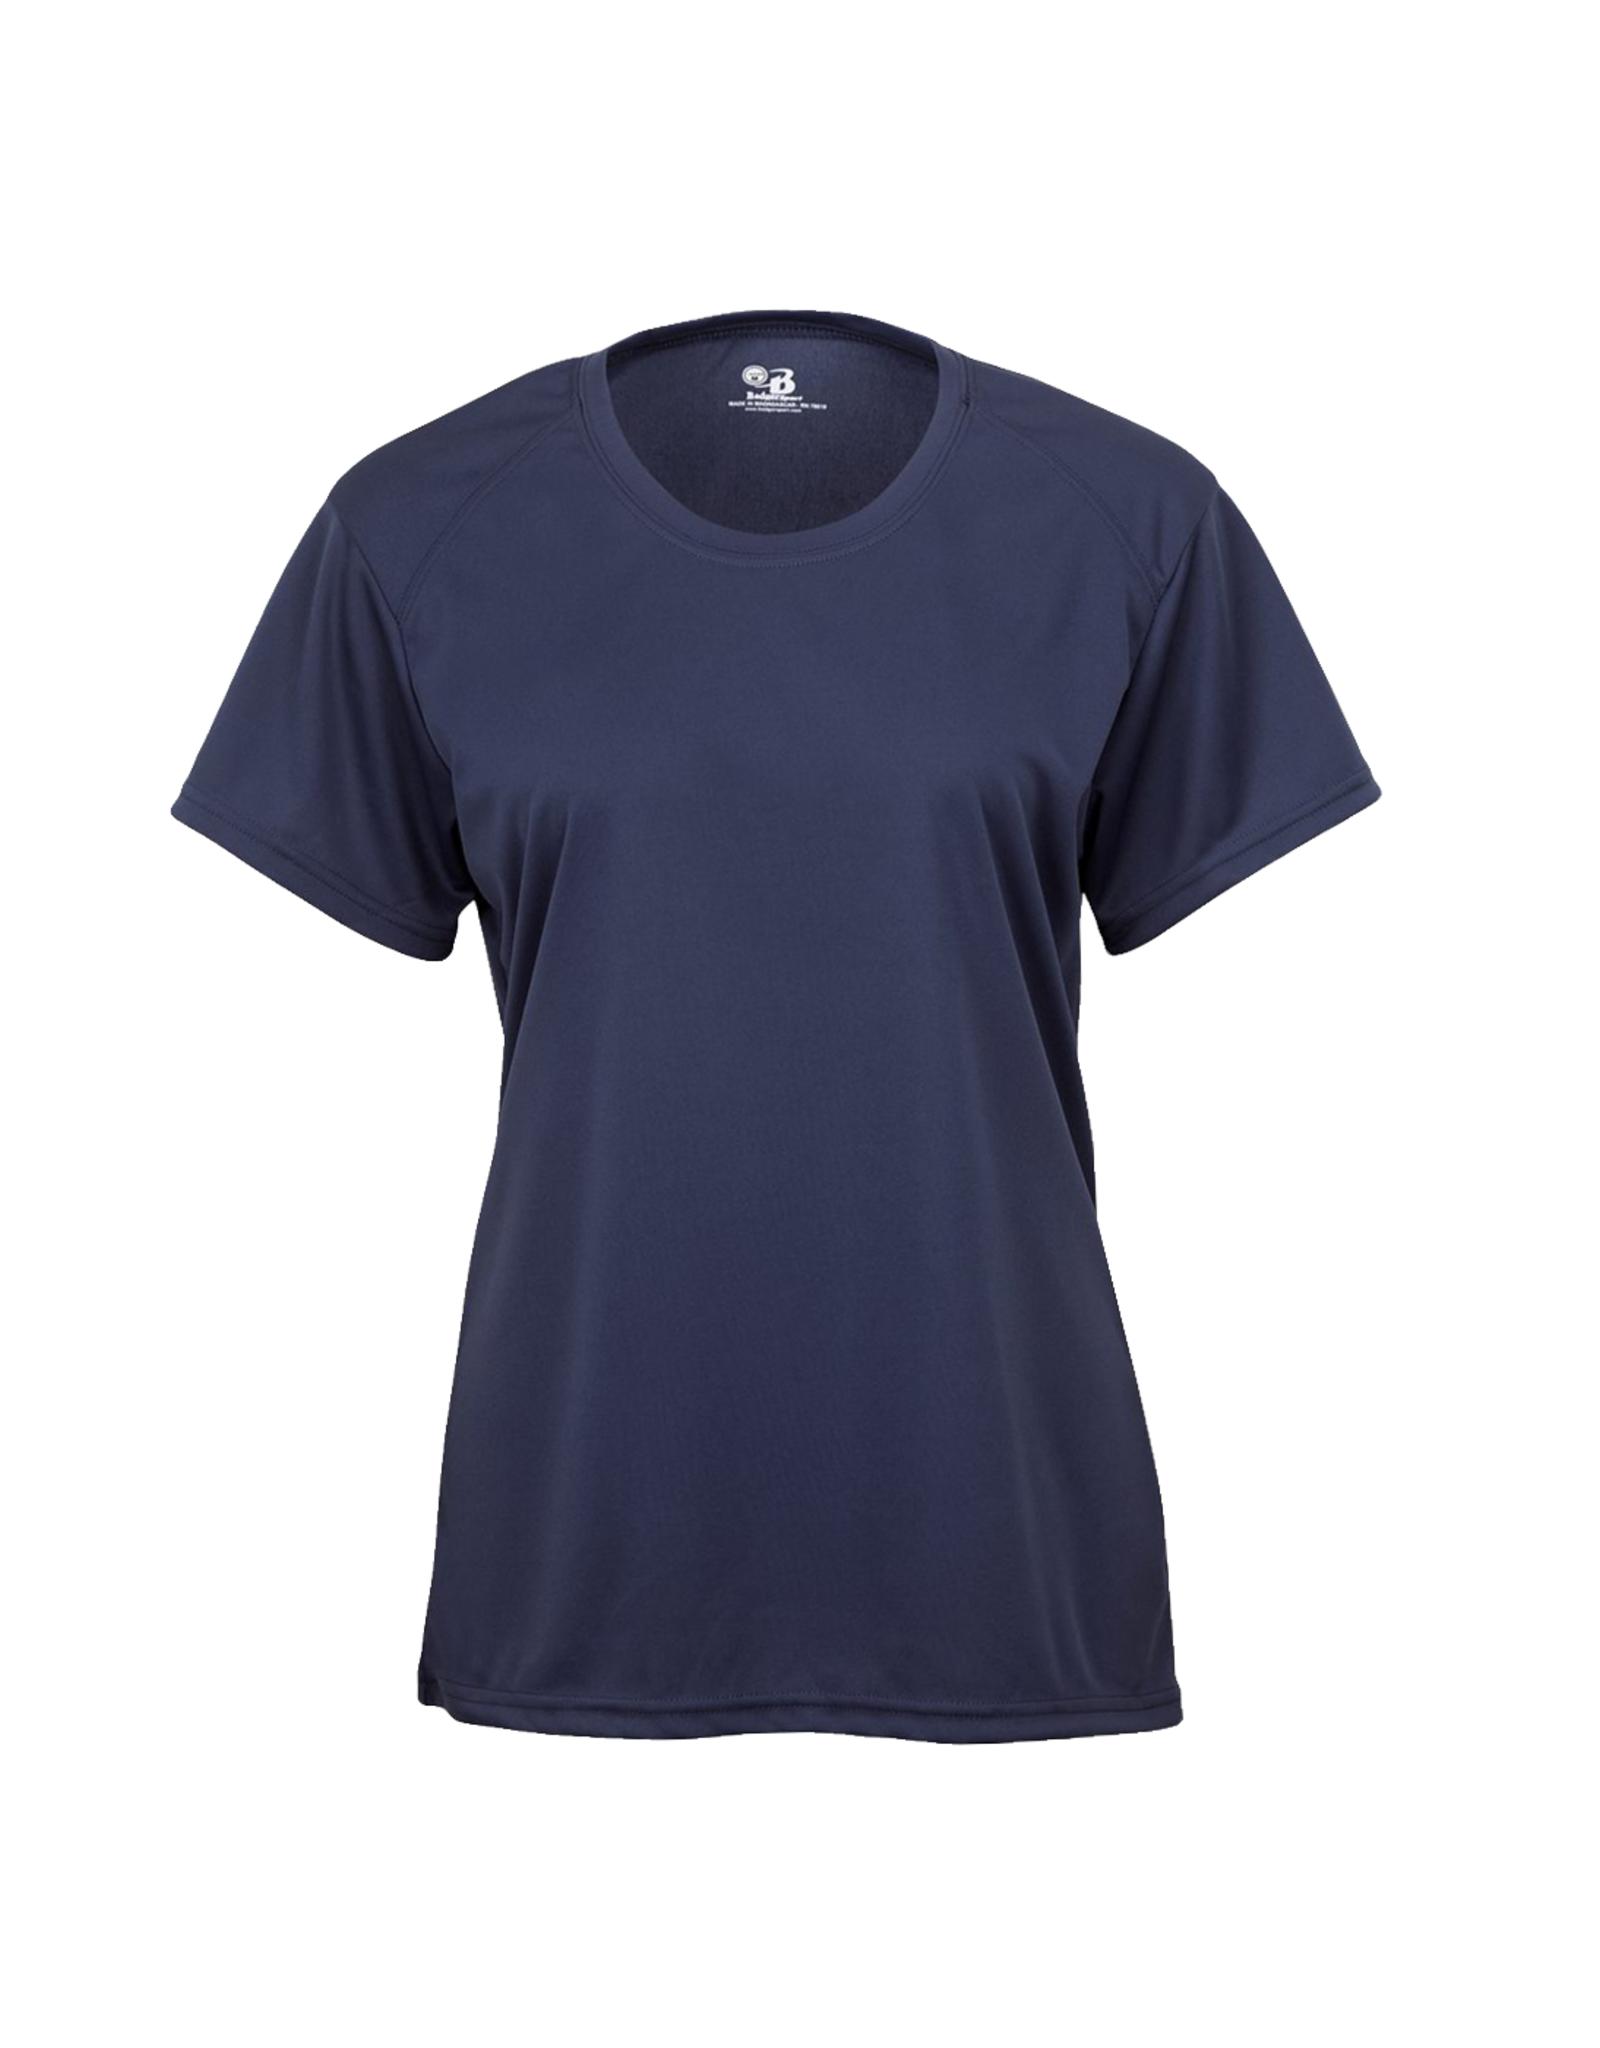 Badger P.E. Shirts / GIRLS